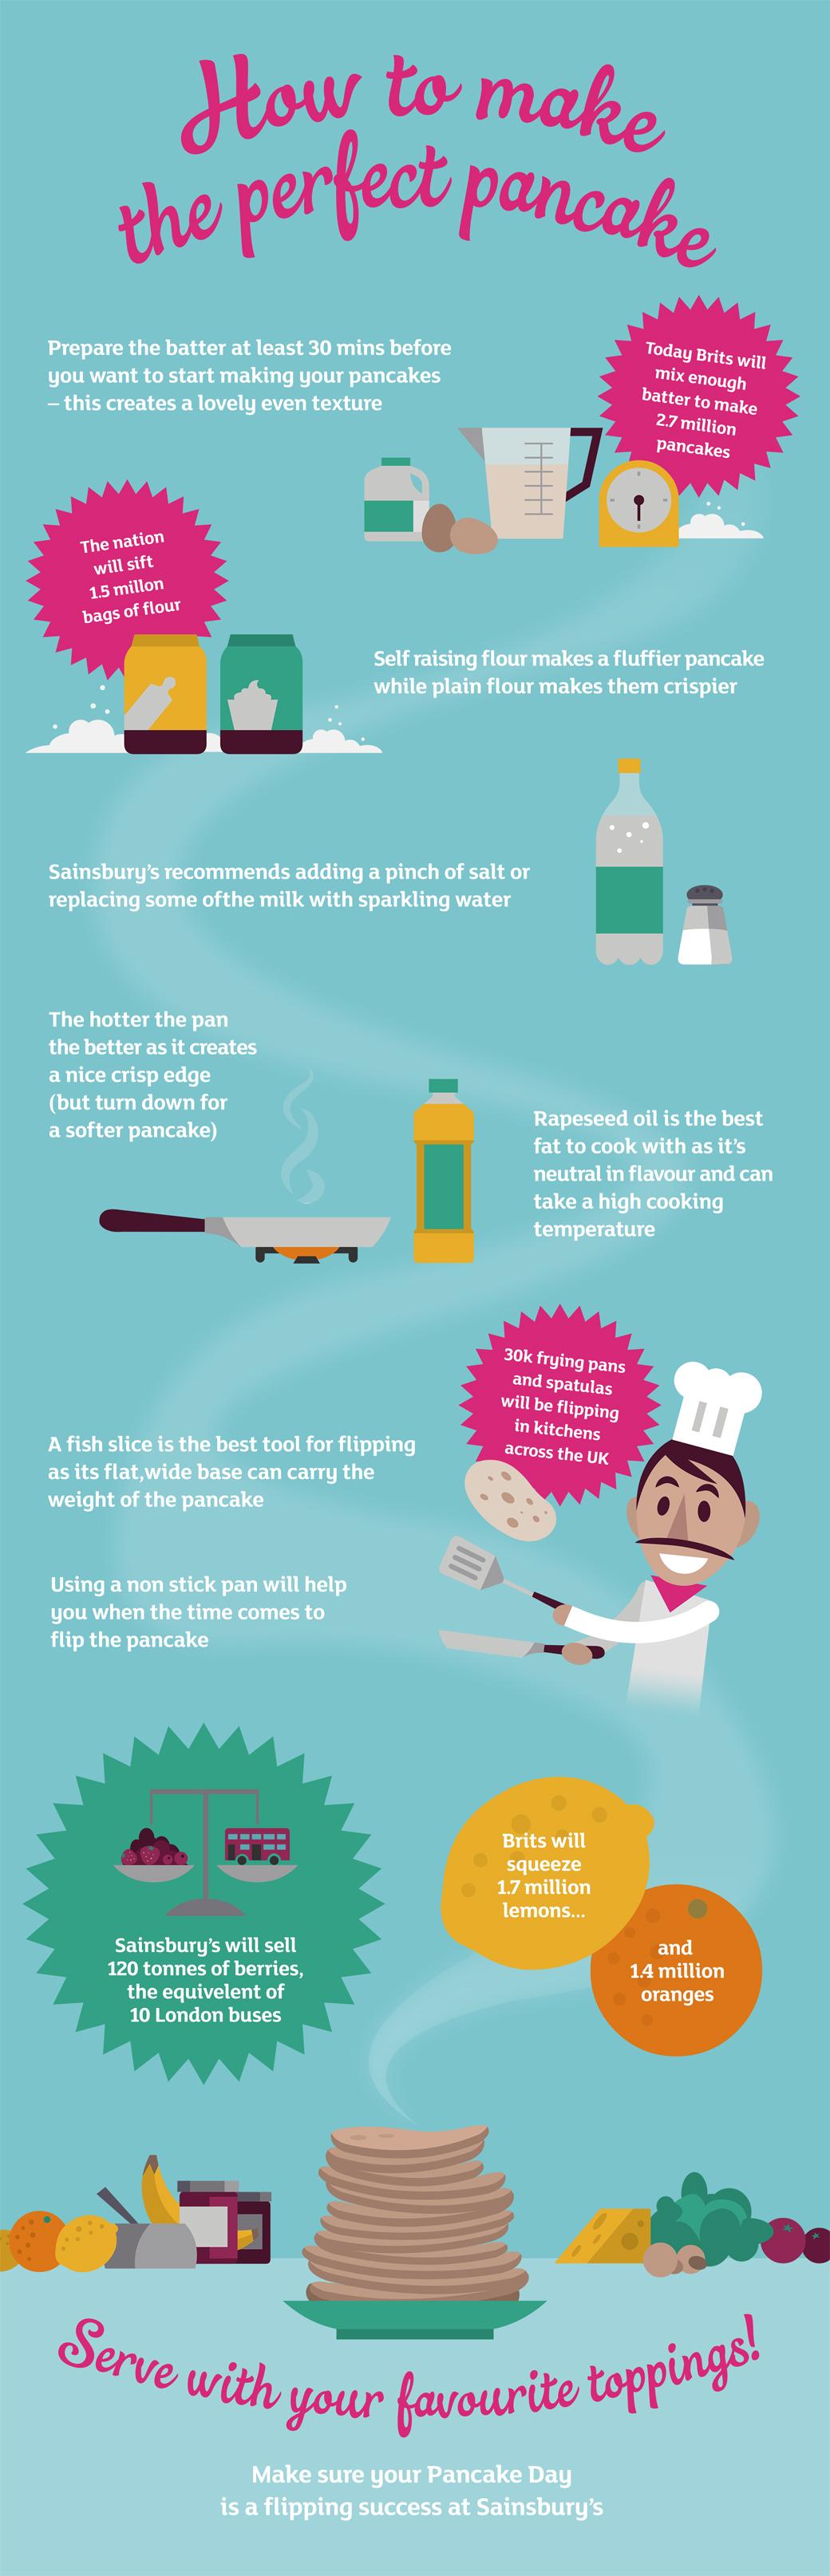 Pancake Day Tips from Sainsbury